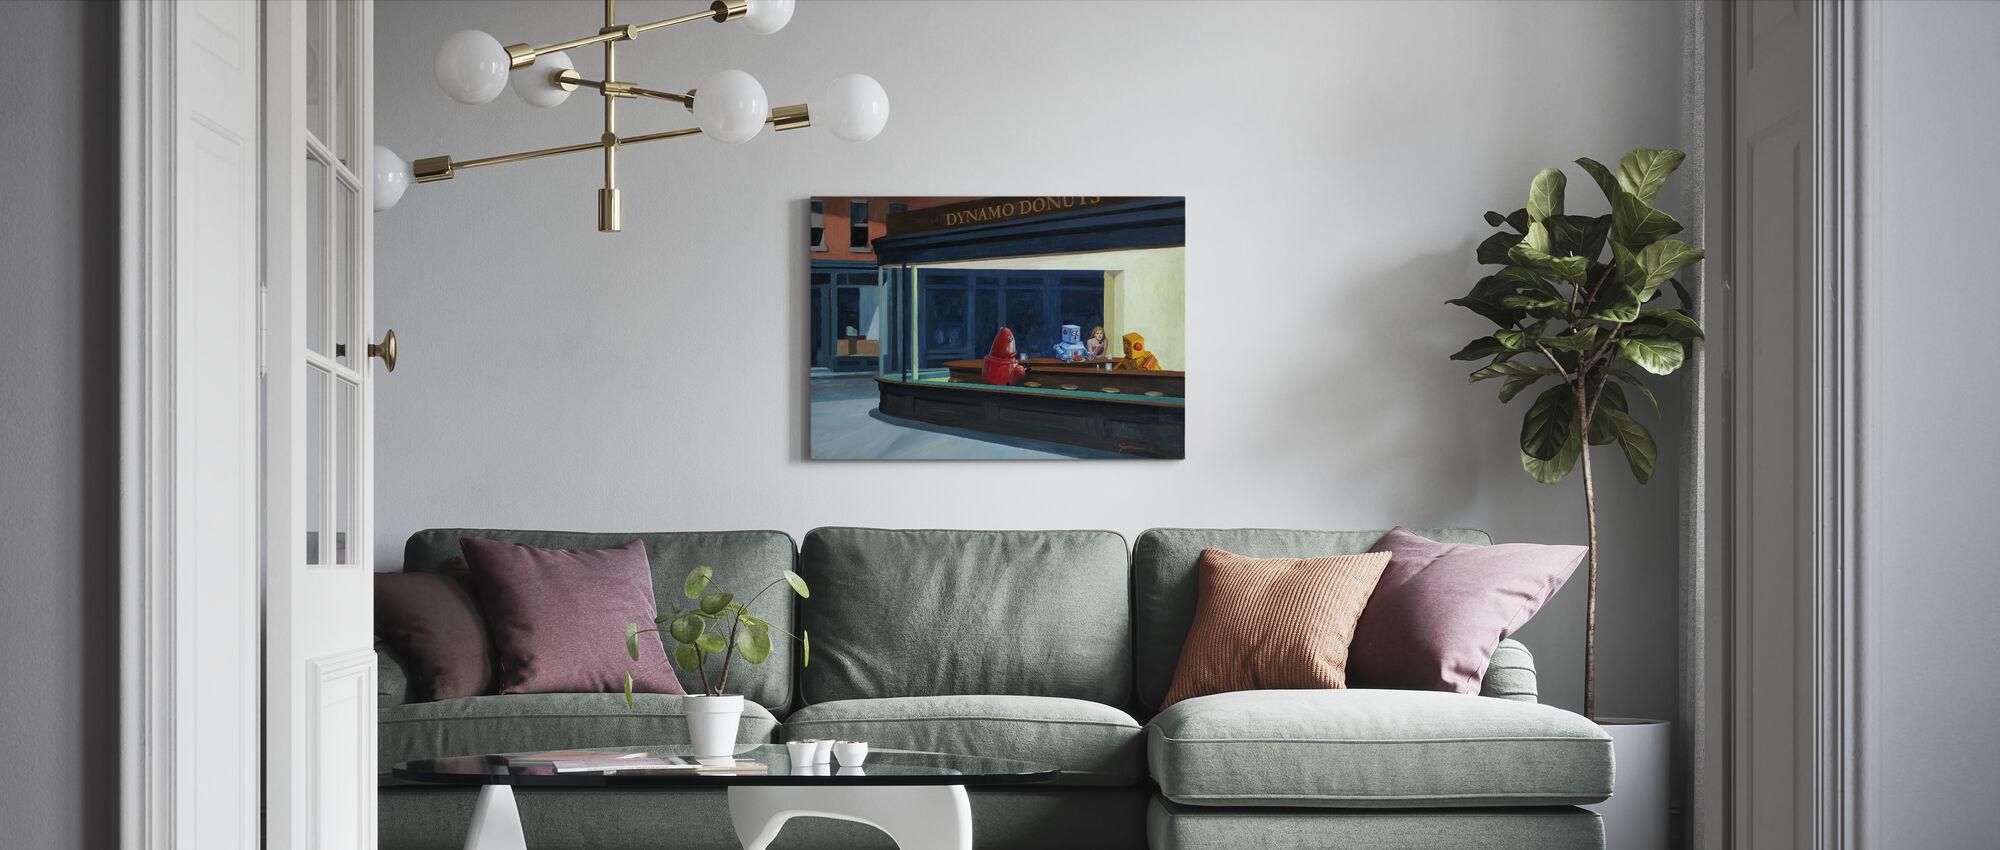 Robo Falken - Leinwandbild - Wohnzimmer